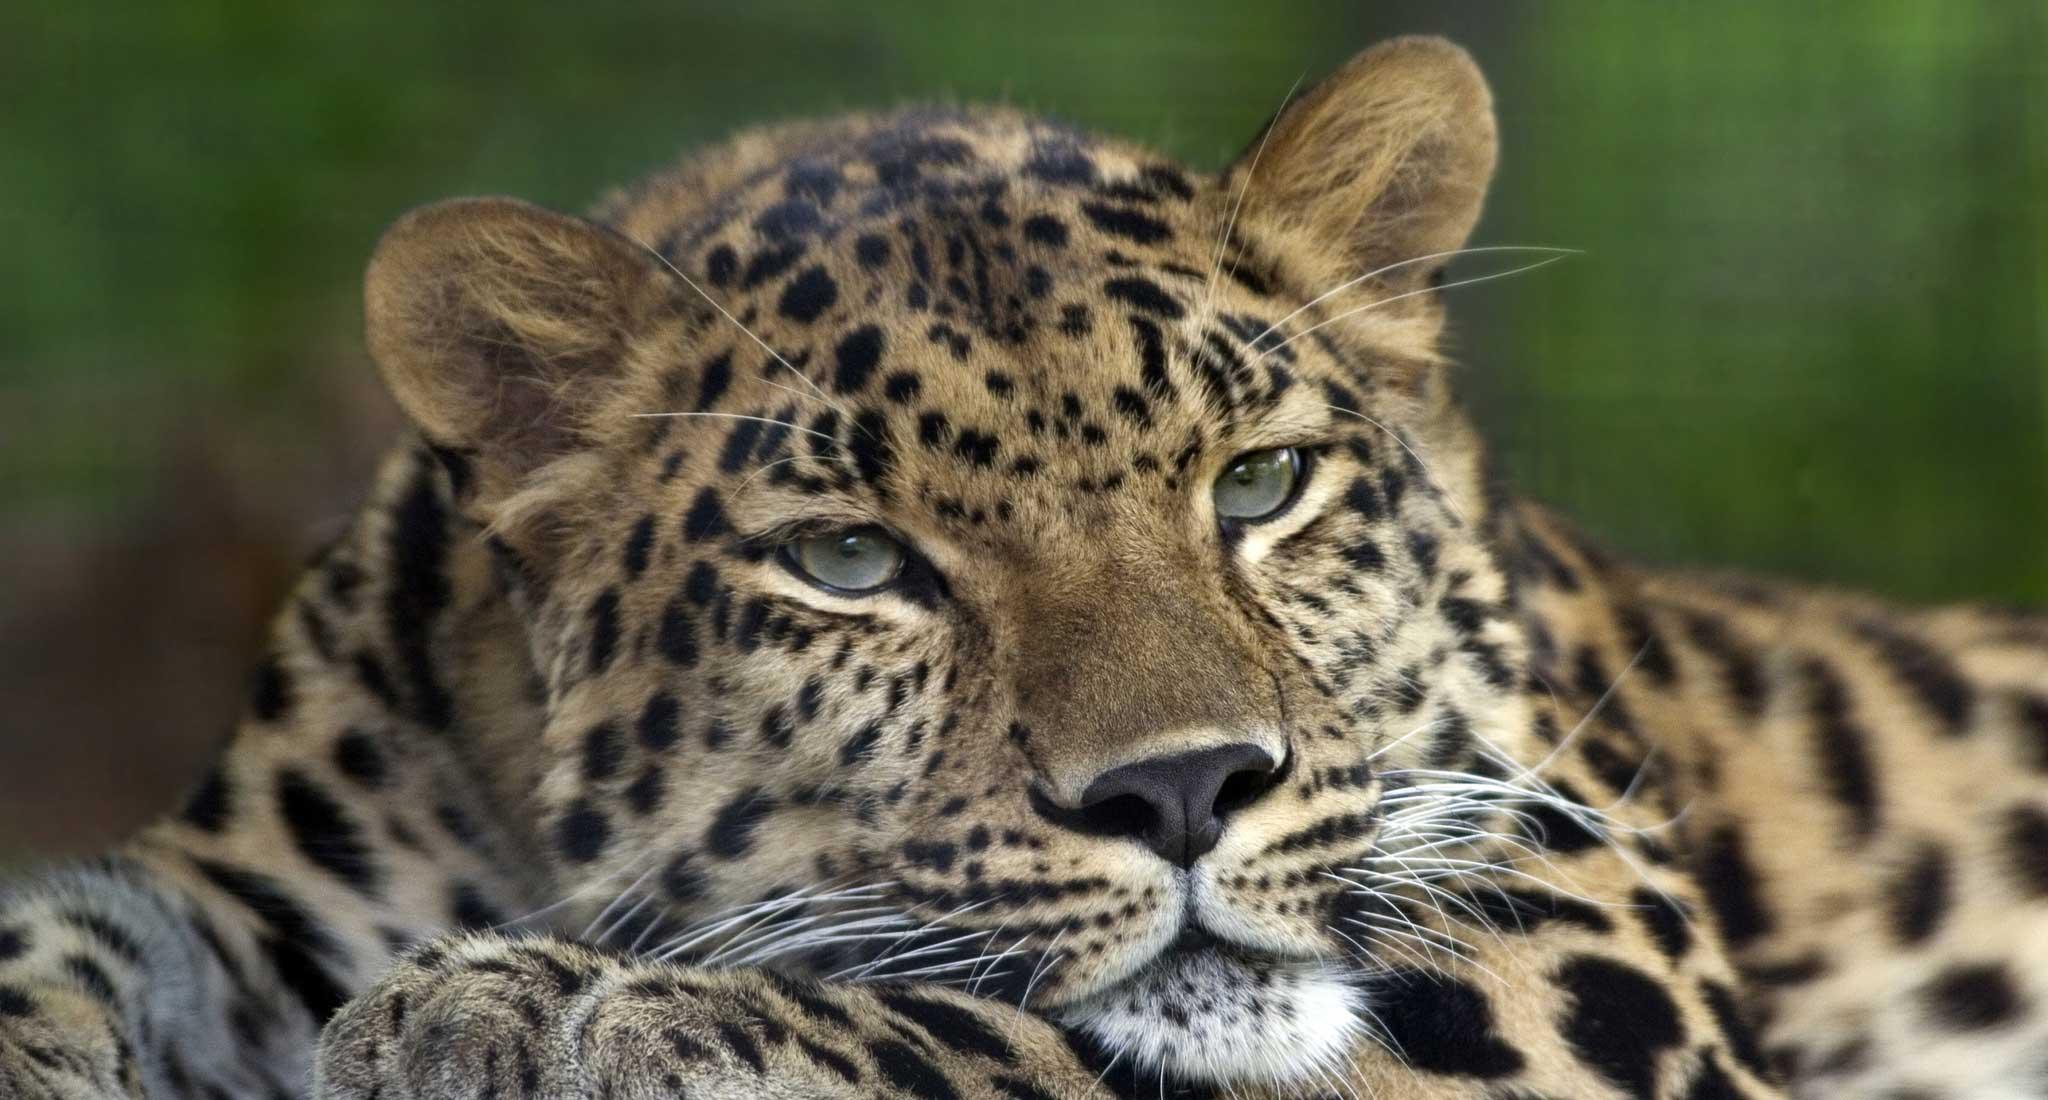 http://greatcats.ru/uploads/posts/2010-06/1277826169_leopard_pokrovskiy.jpg